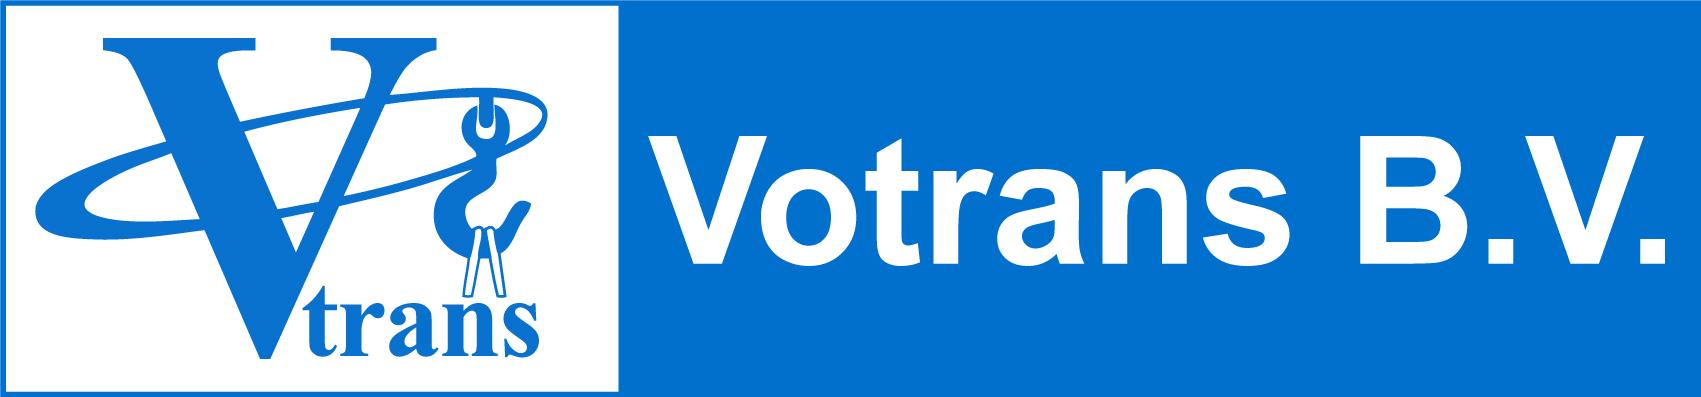 http://votrans.nl/wp-content/uploads/2016/07/Votrans-logo-blauw.jpg